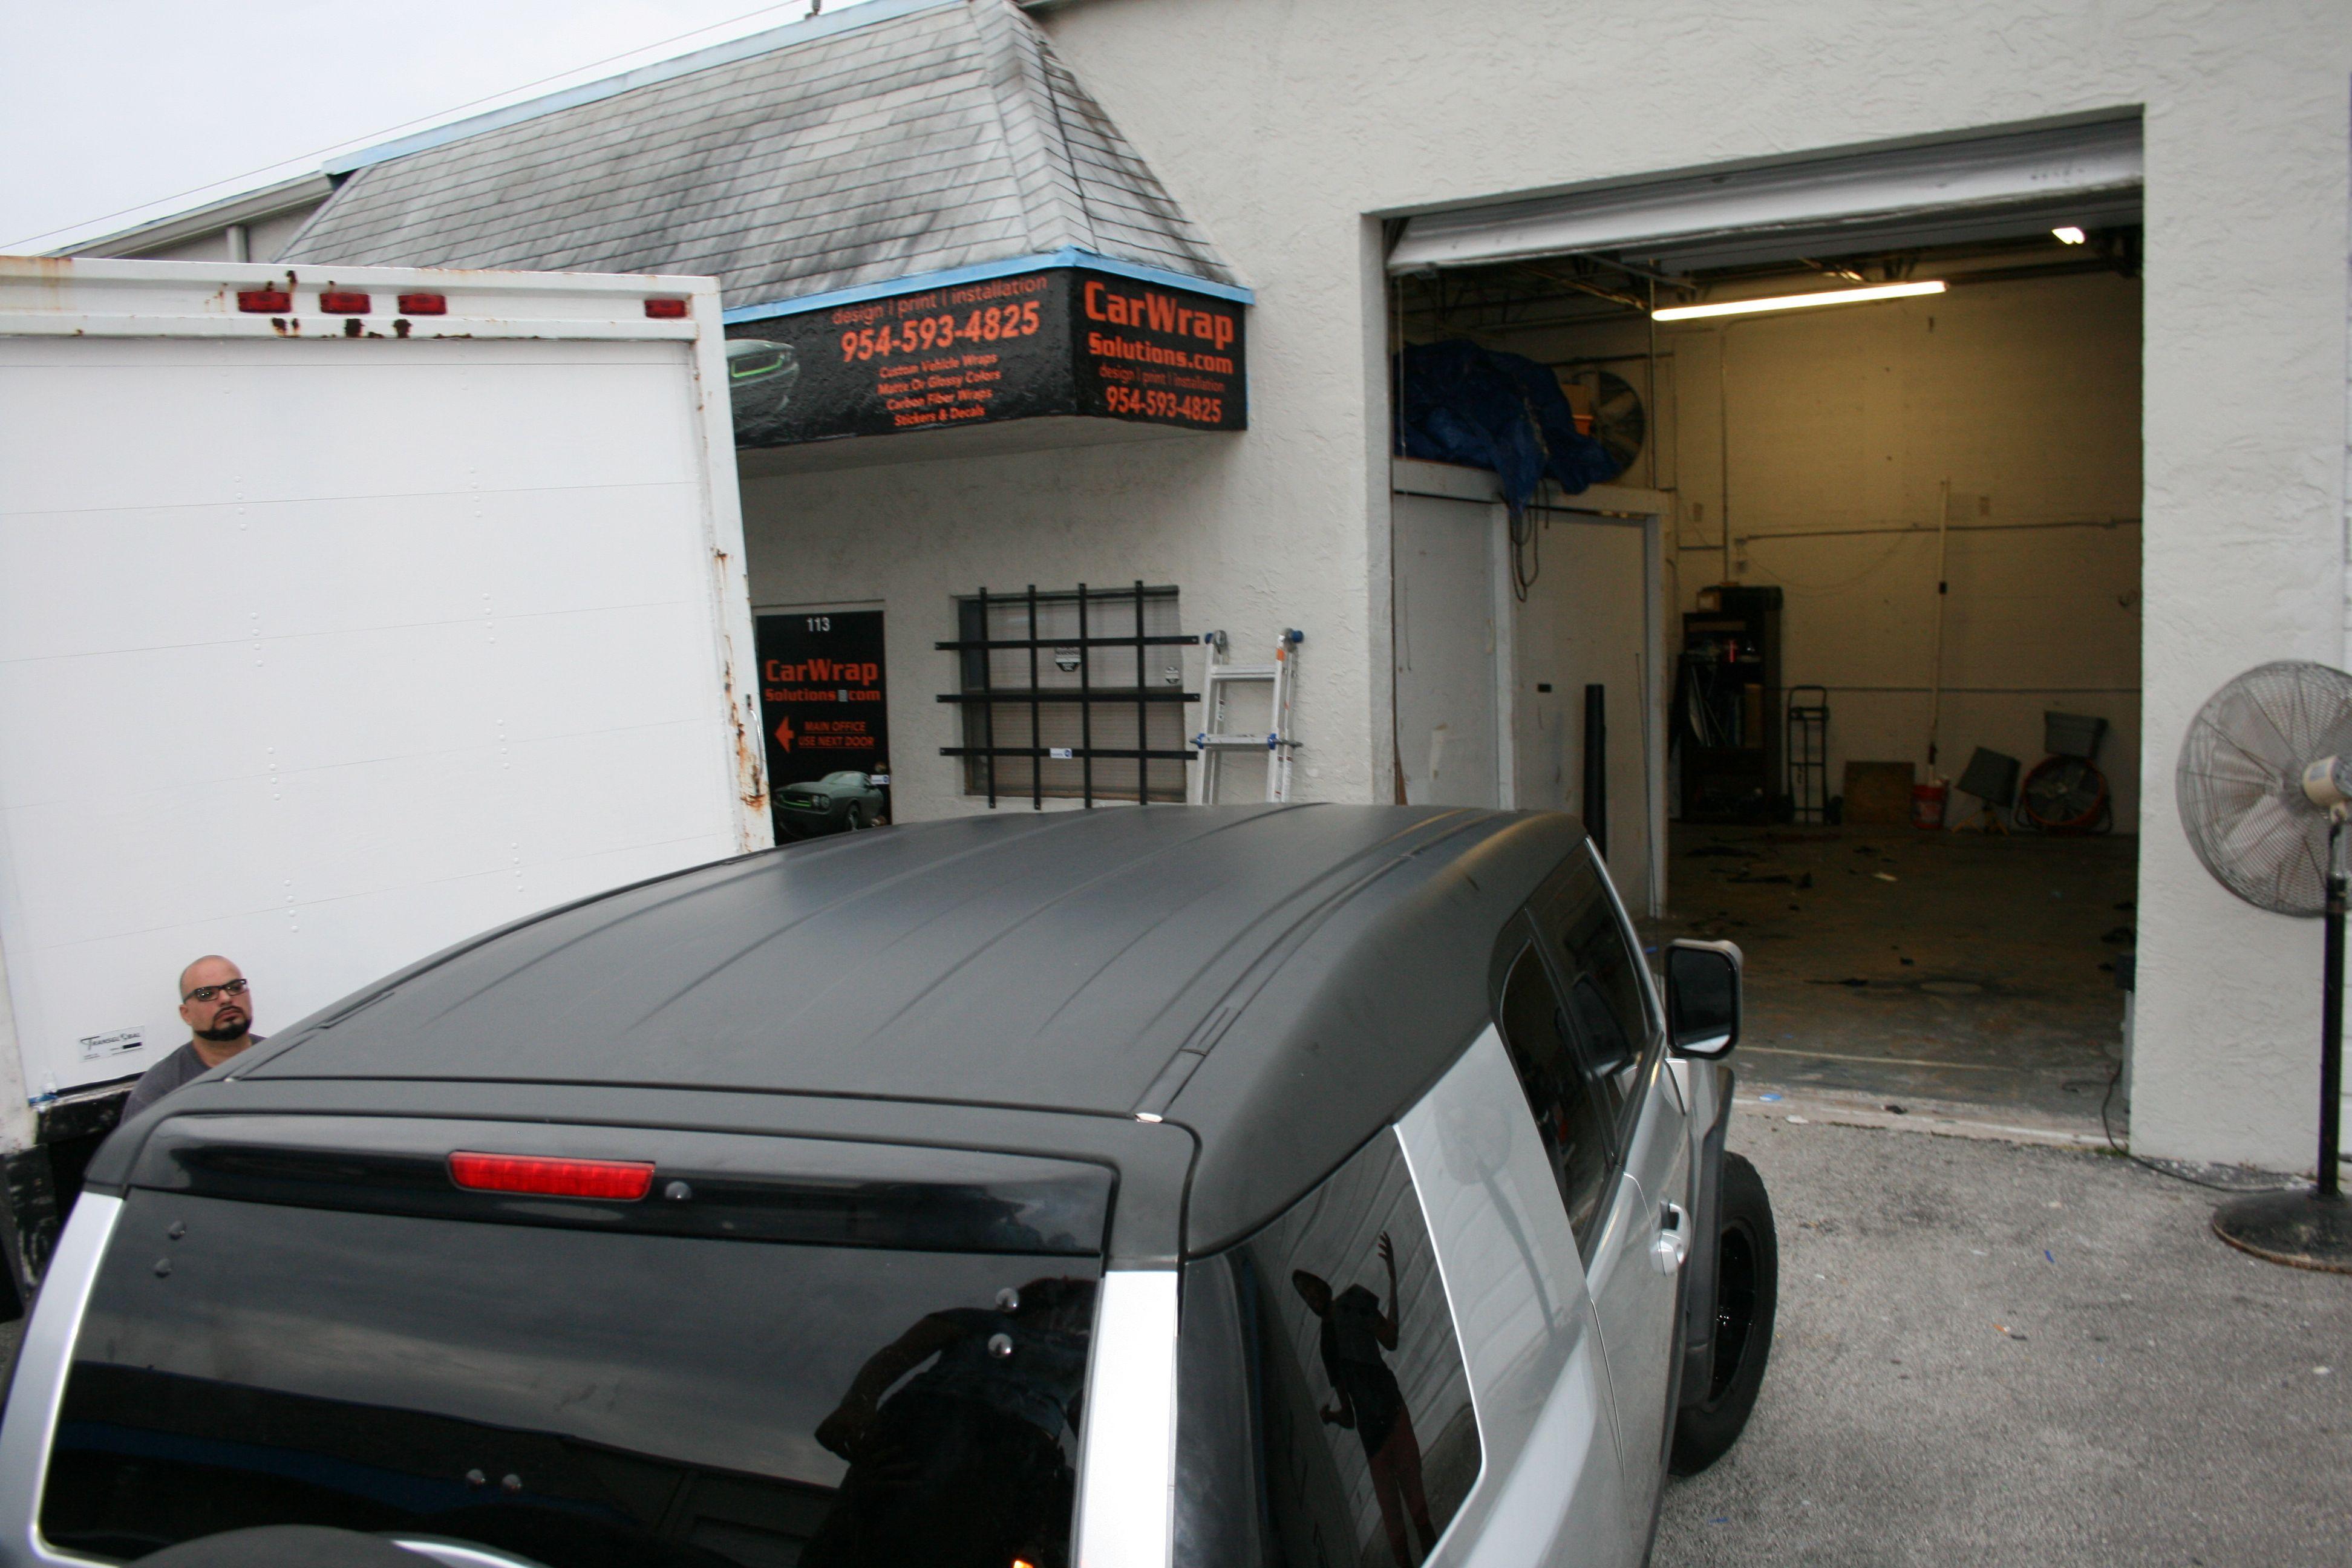 Toyota Fj Cruiser Matte Black Vinyl Wrapped Roof Wrap Fort